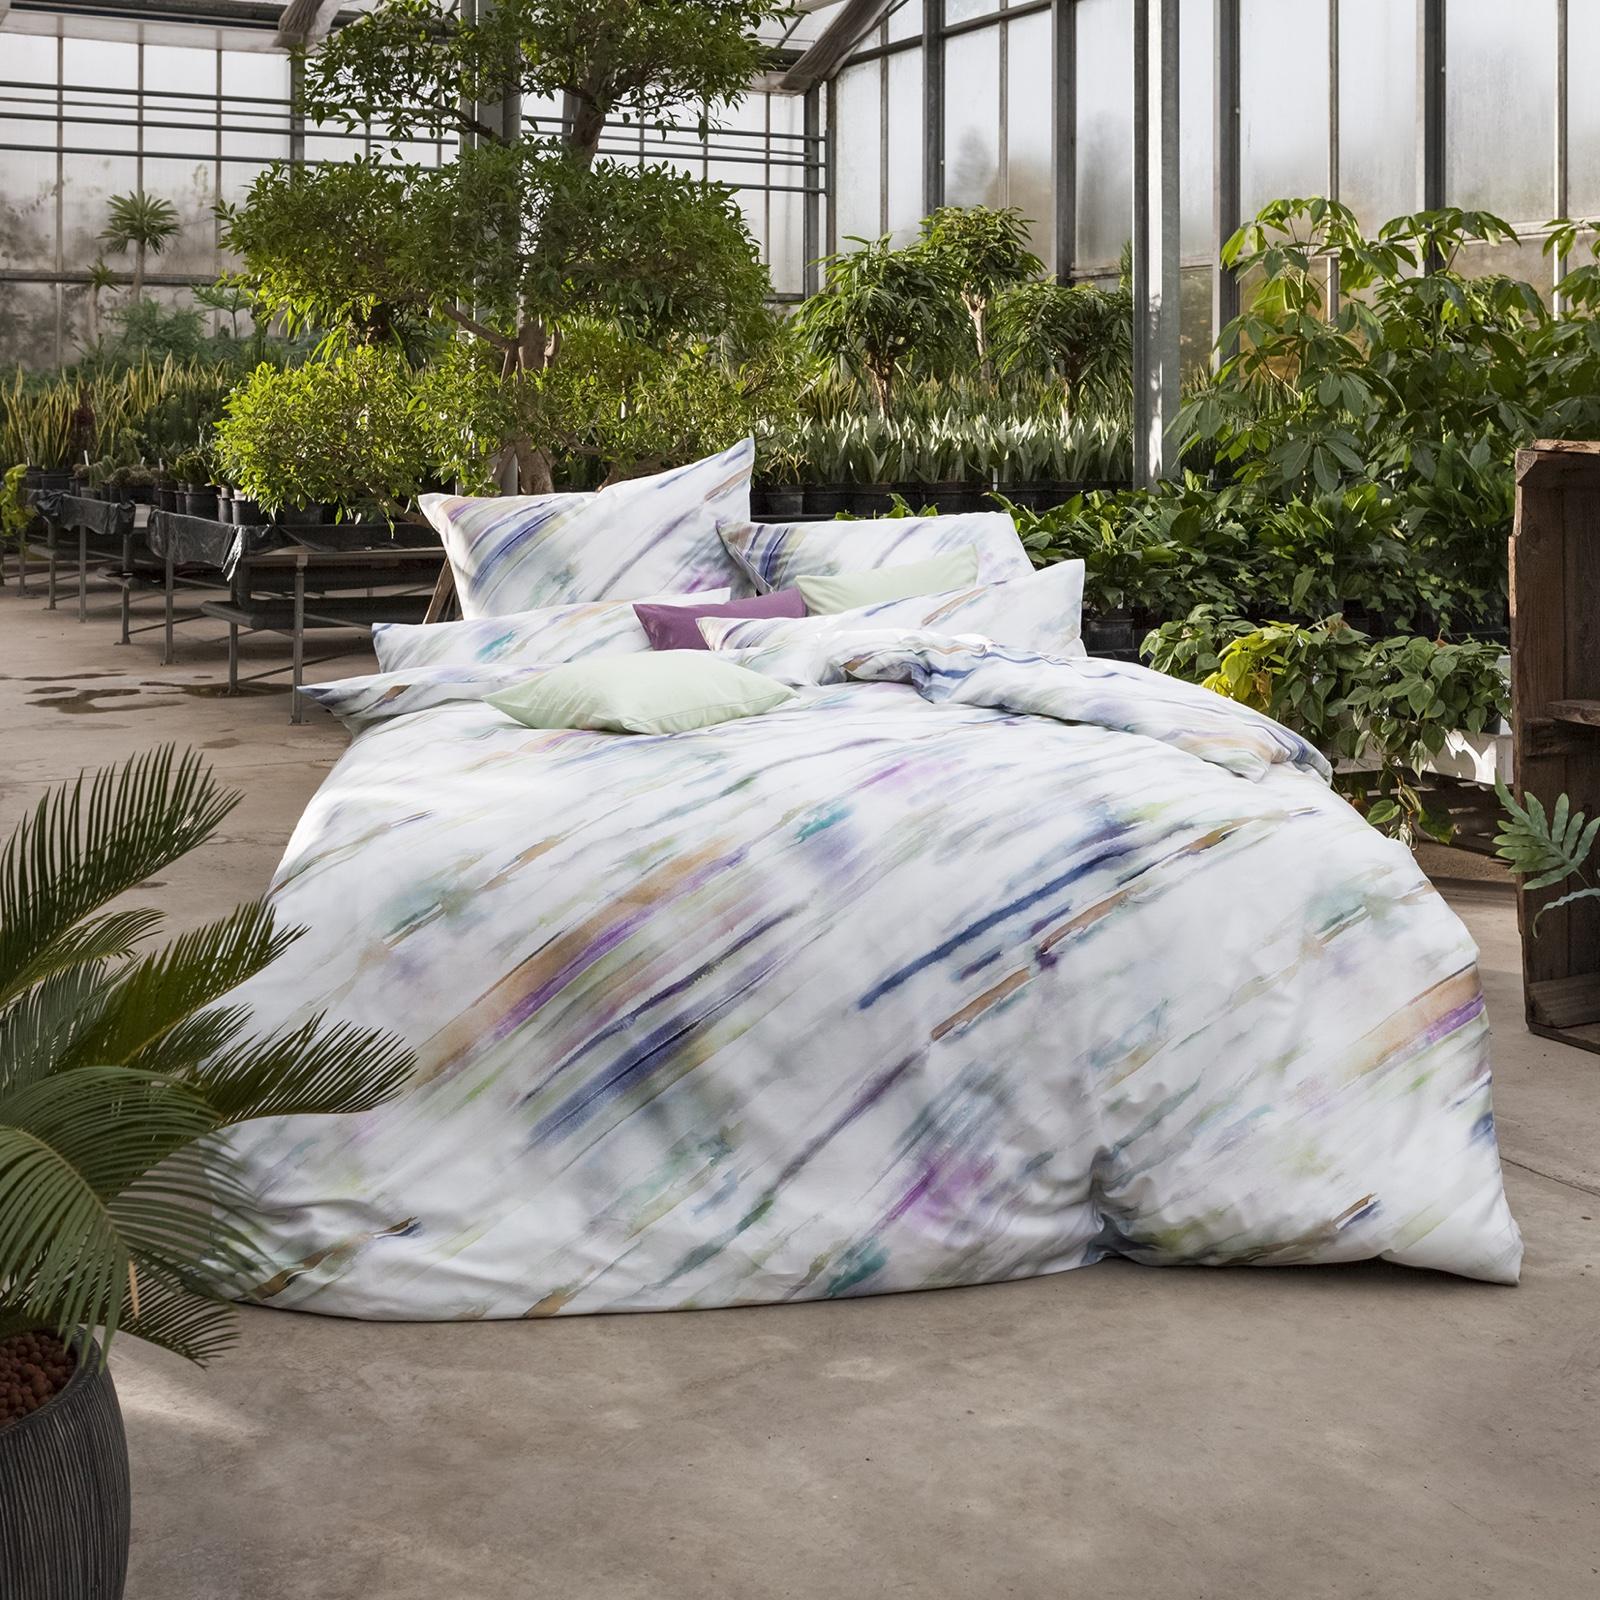 estella bettw sche watercolor 4726 985 multicolor mako satin. Black Bedroom Furniture Sets. Home Design Ideas